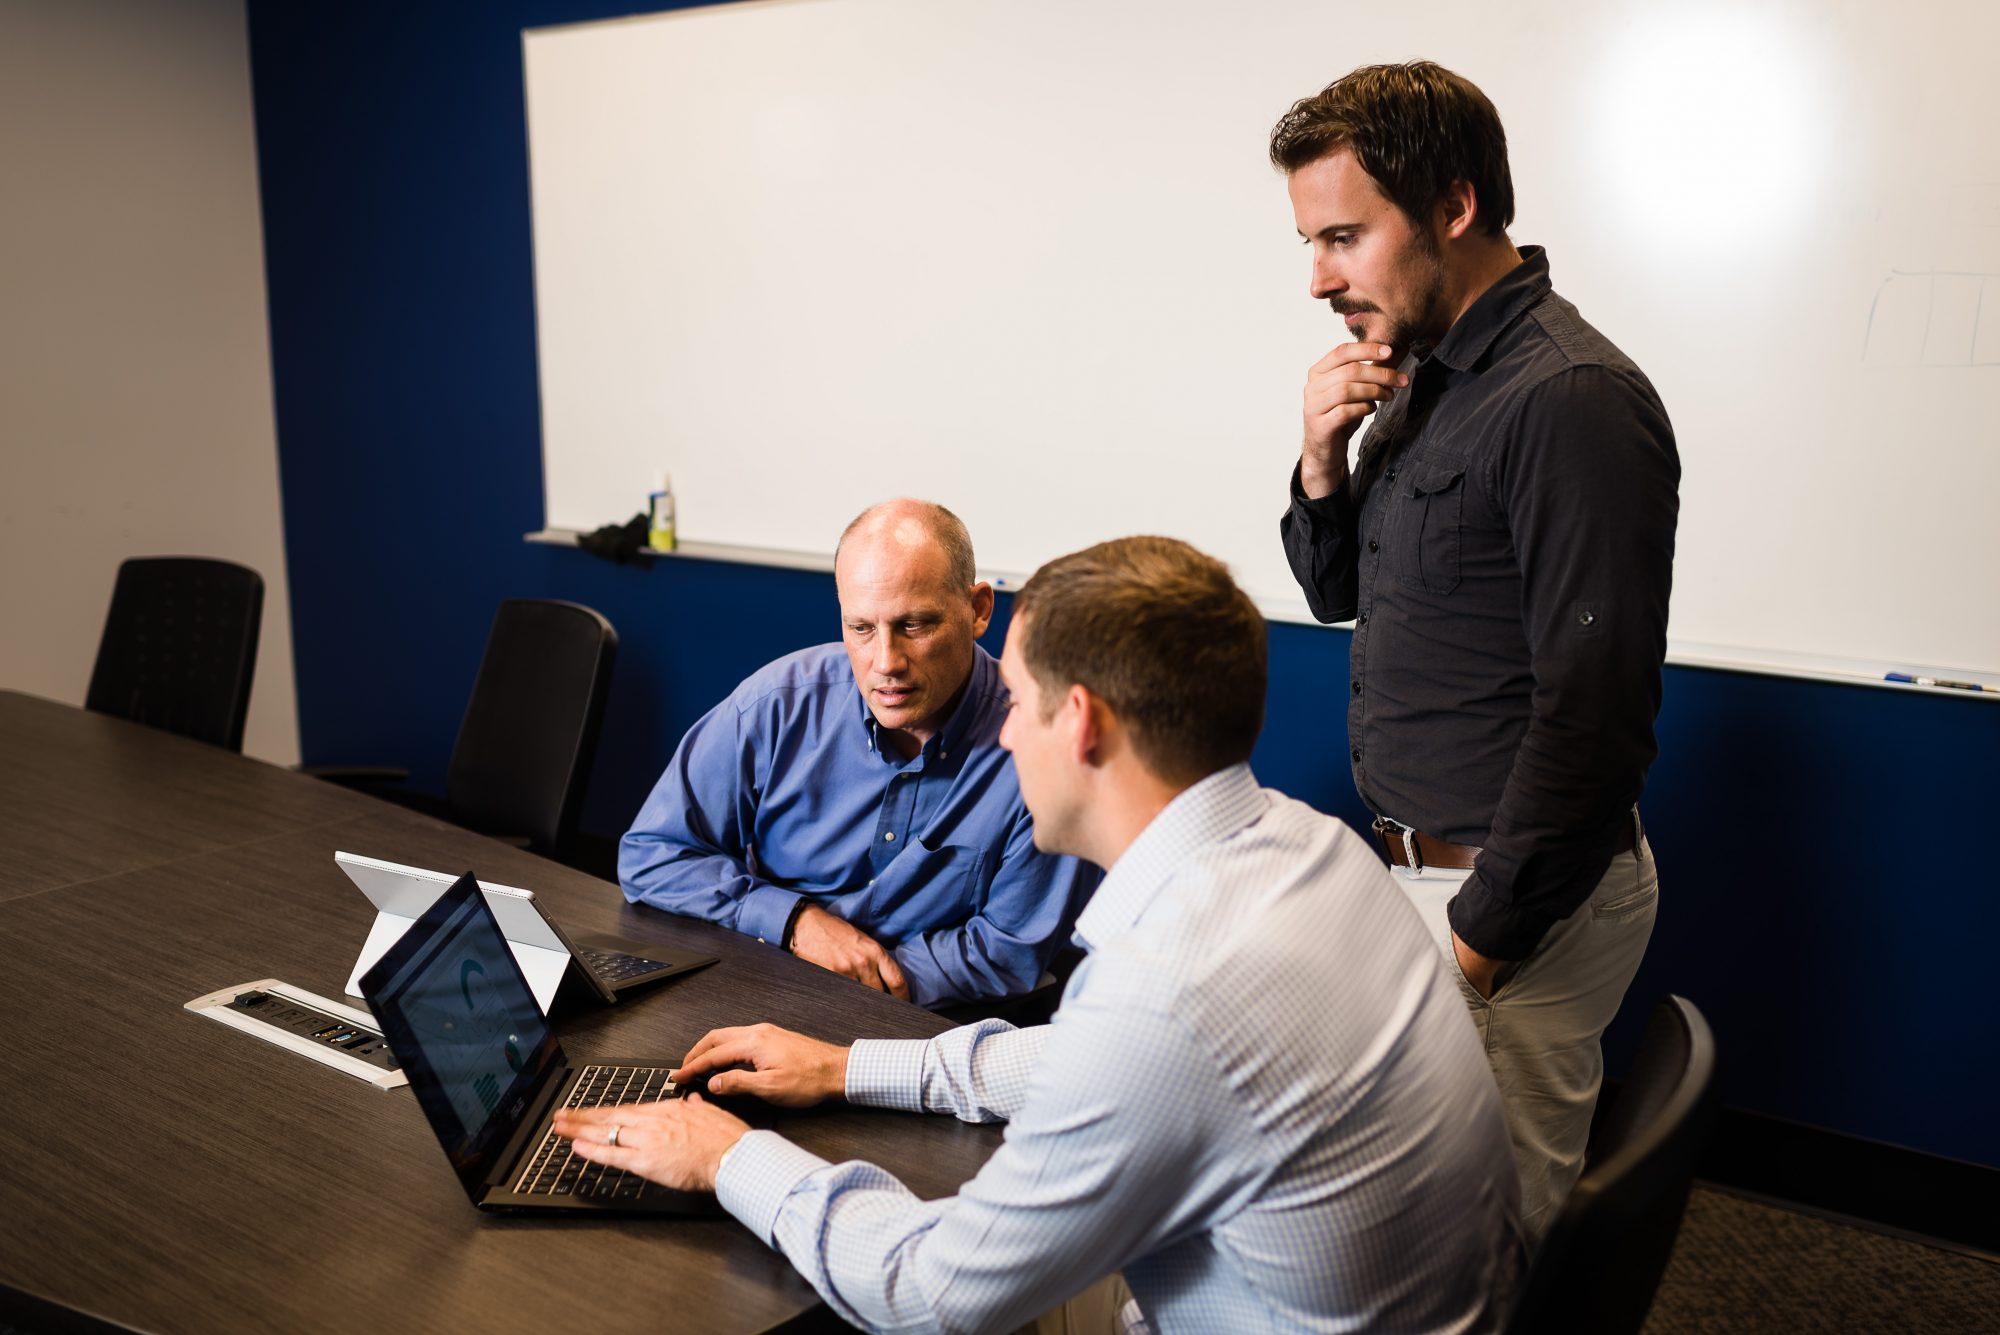 3 men testing ux design changes on a laptop